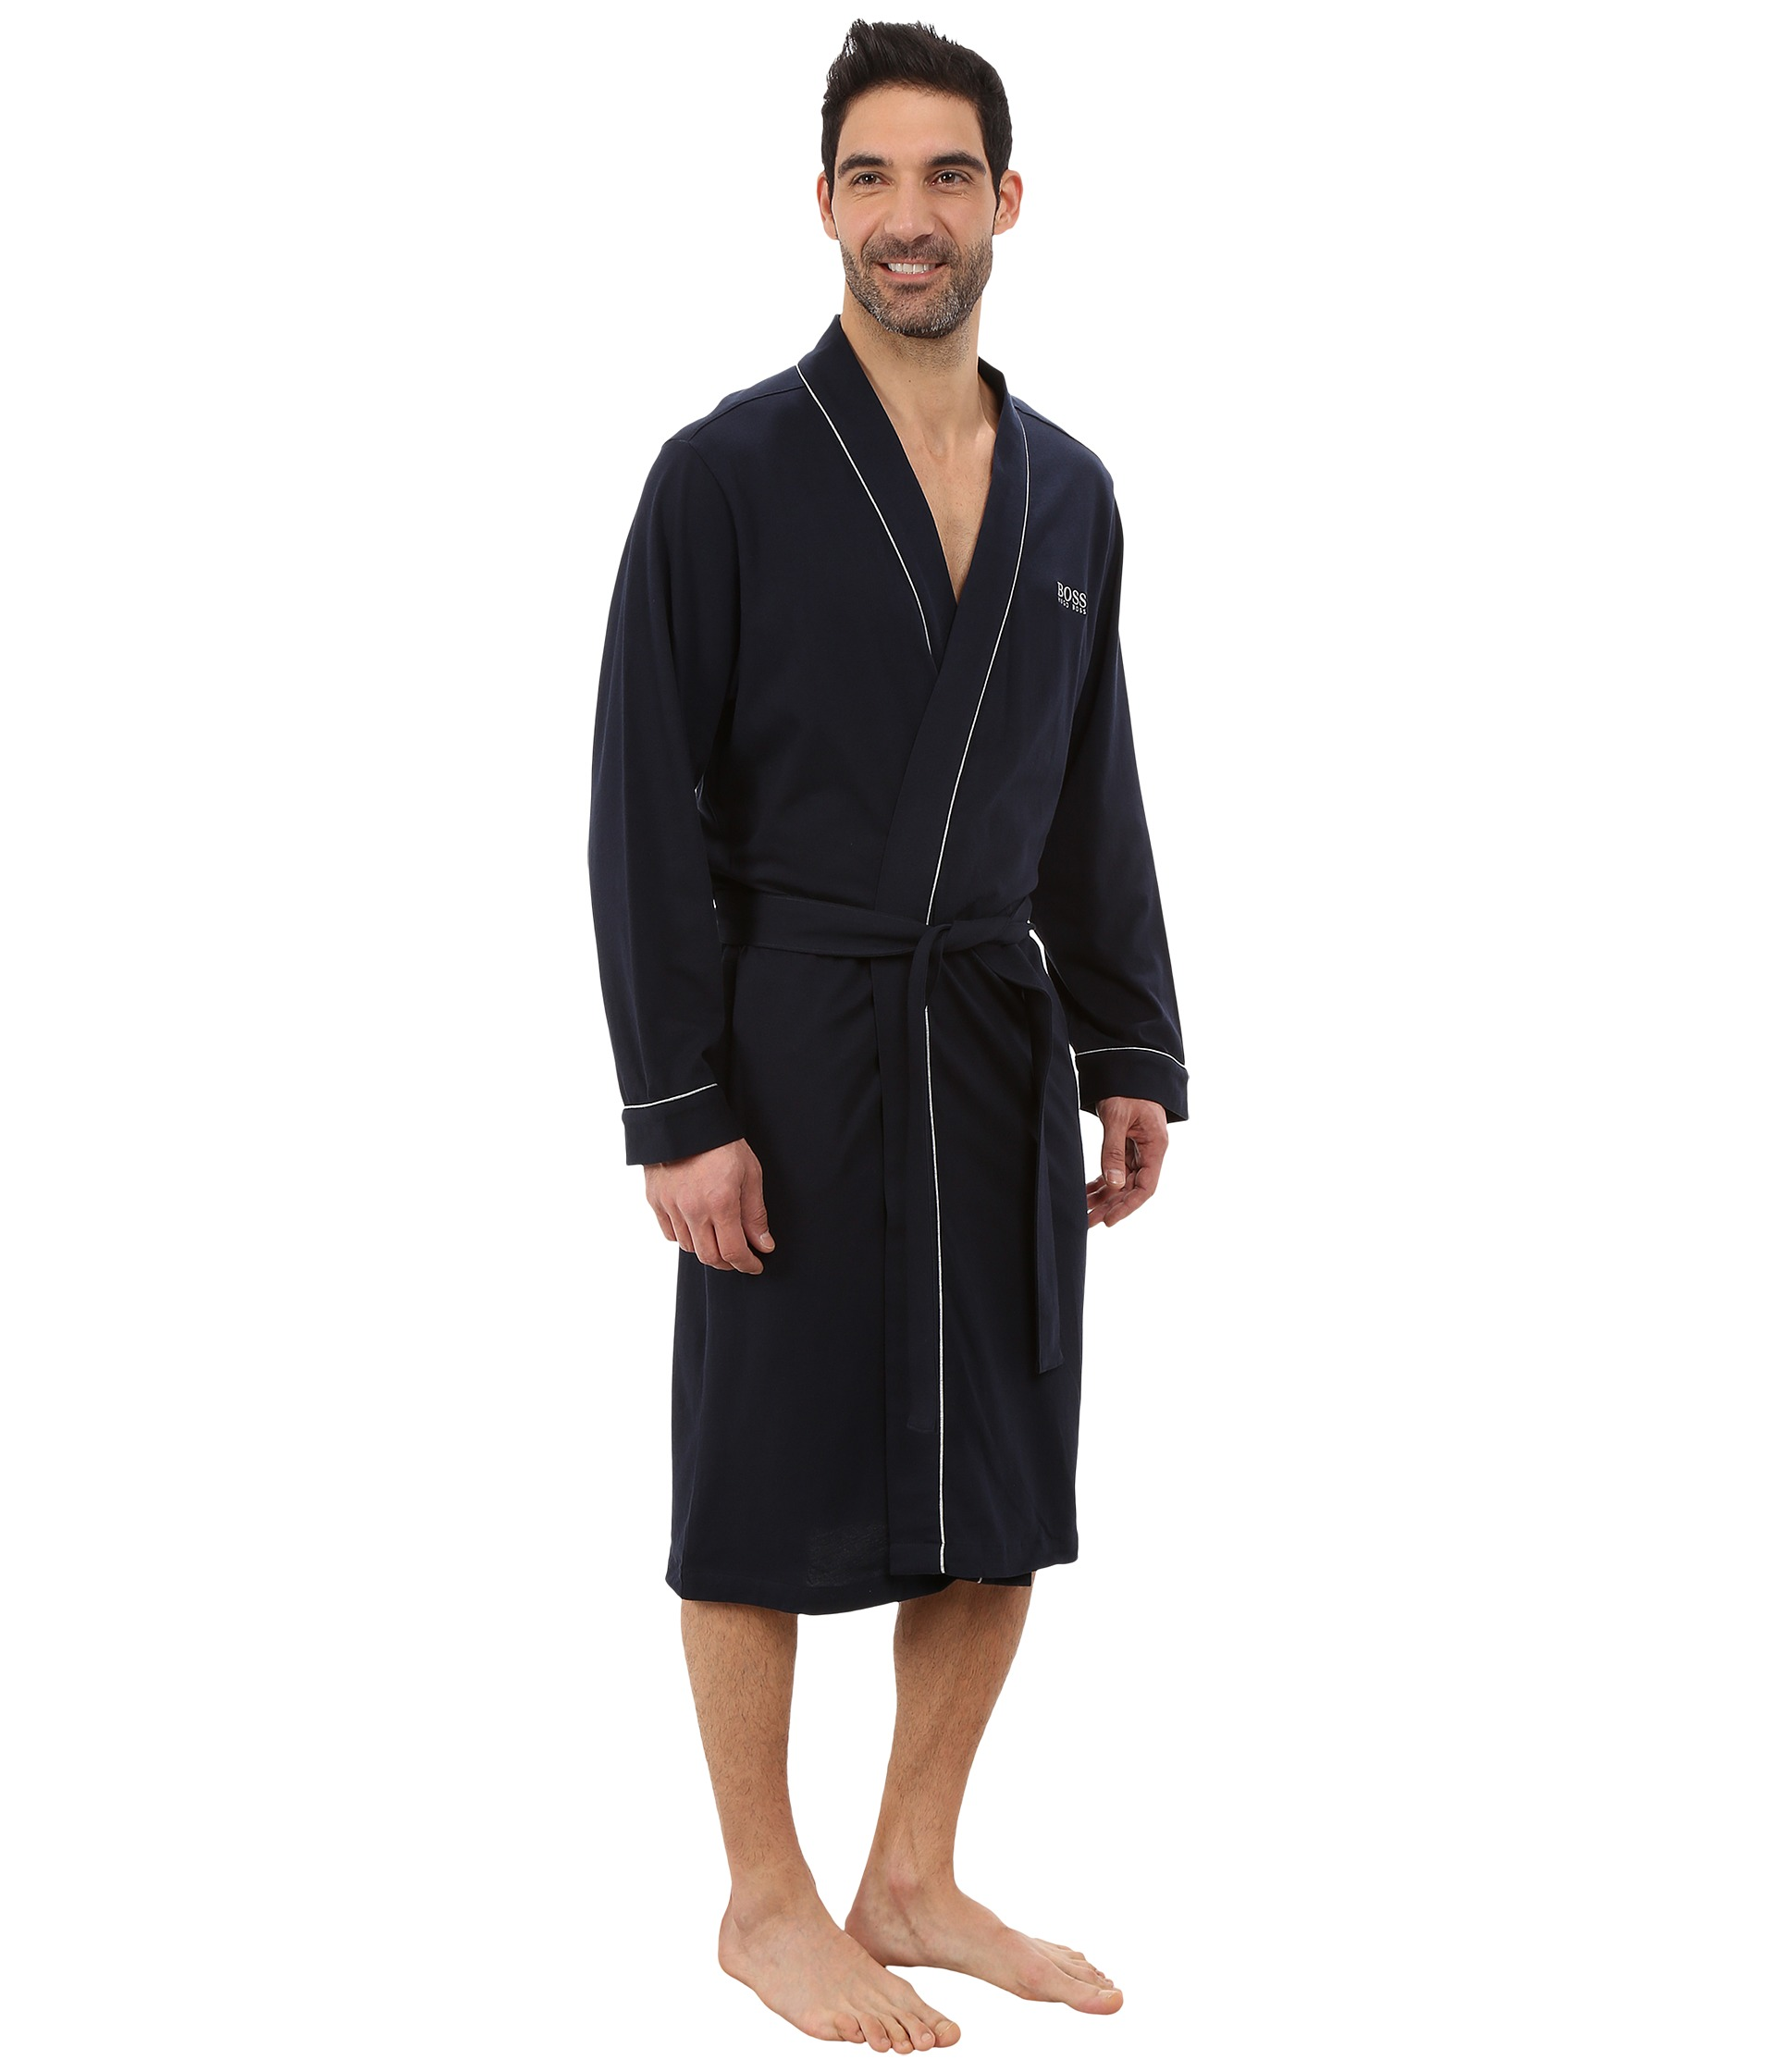 Hugo boss robes for Robe de mariage hugo boss